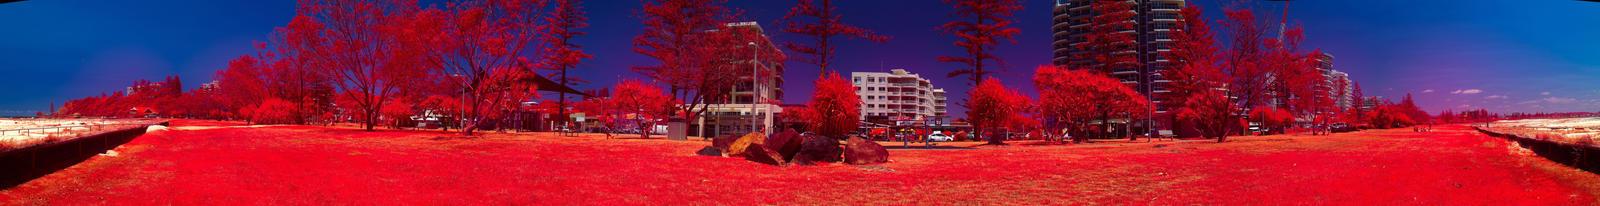 Kirra Shops, Gold Coast, Qld Australia Spring 2013 by colinbm1